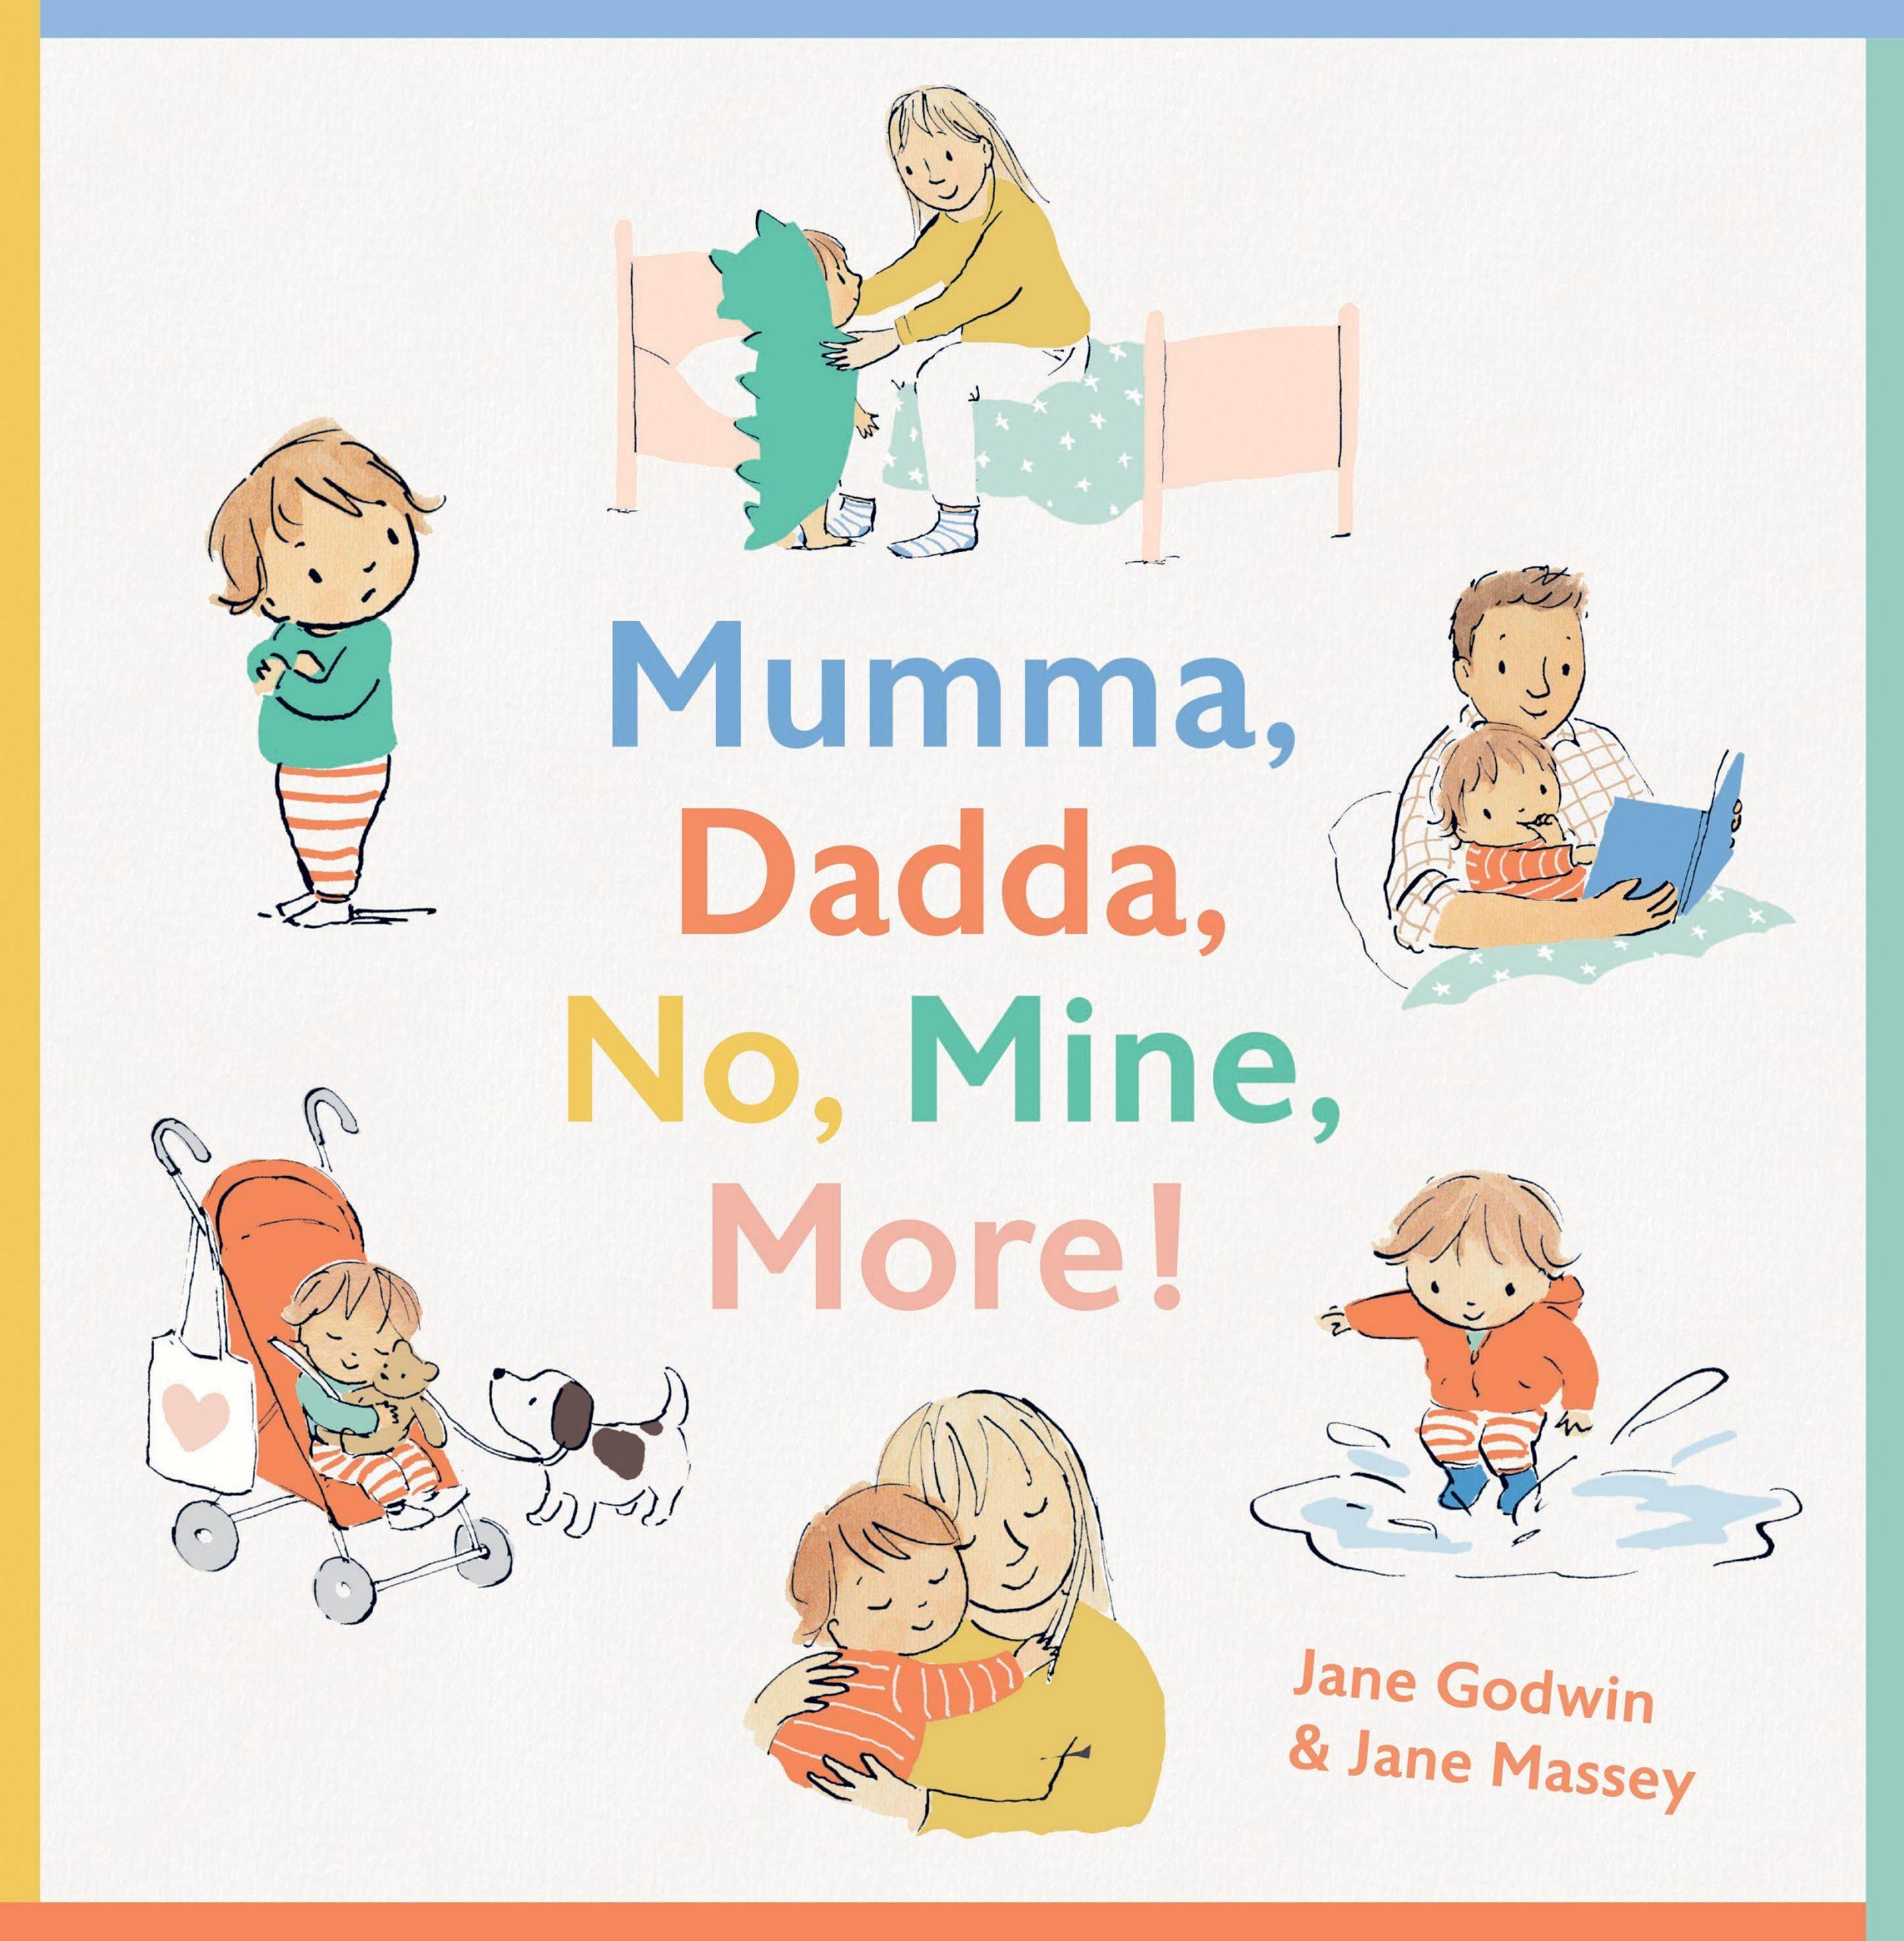 Mumma, Dadda, No, Mine, More